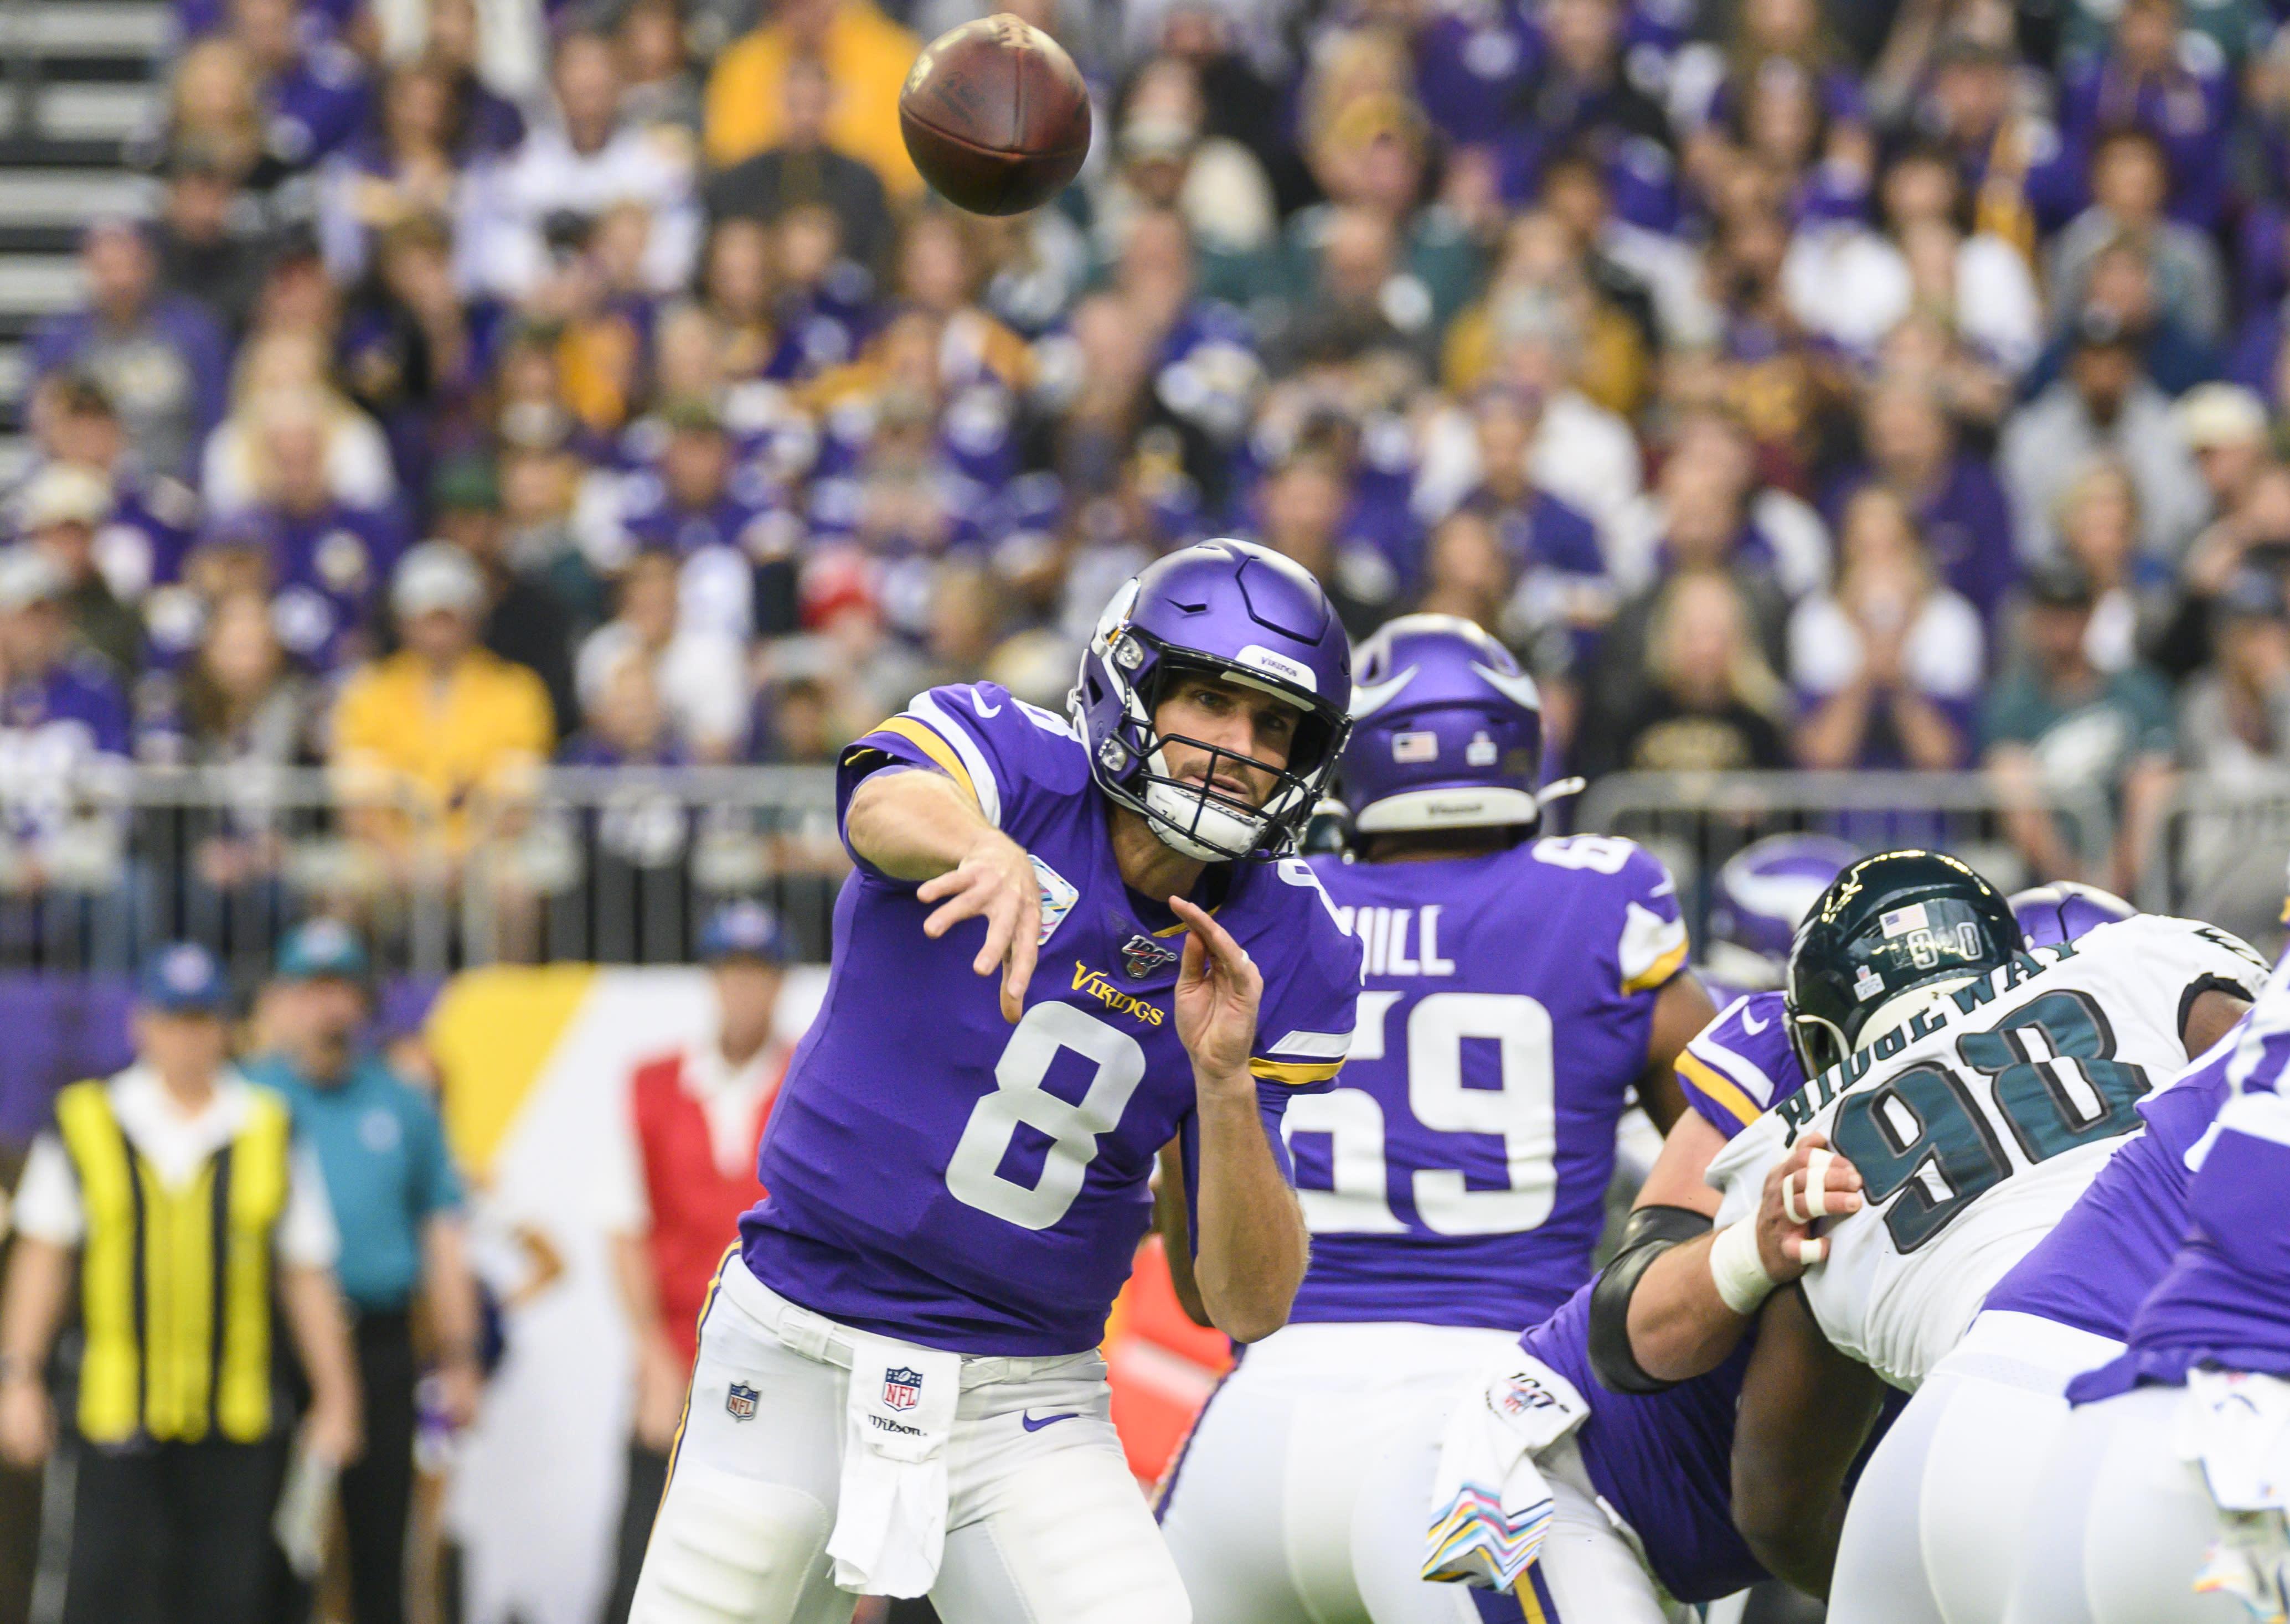 nfl quarterback rankings 2019 2020 season - HD3200×2270